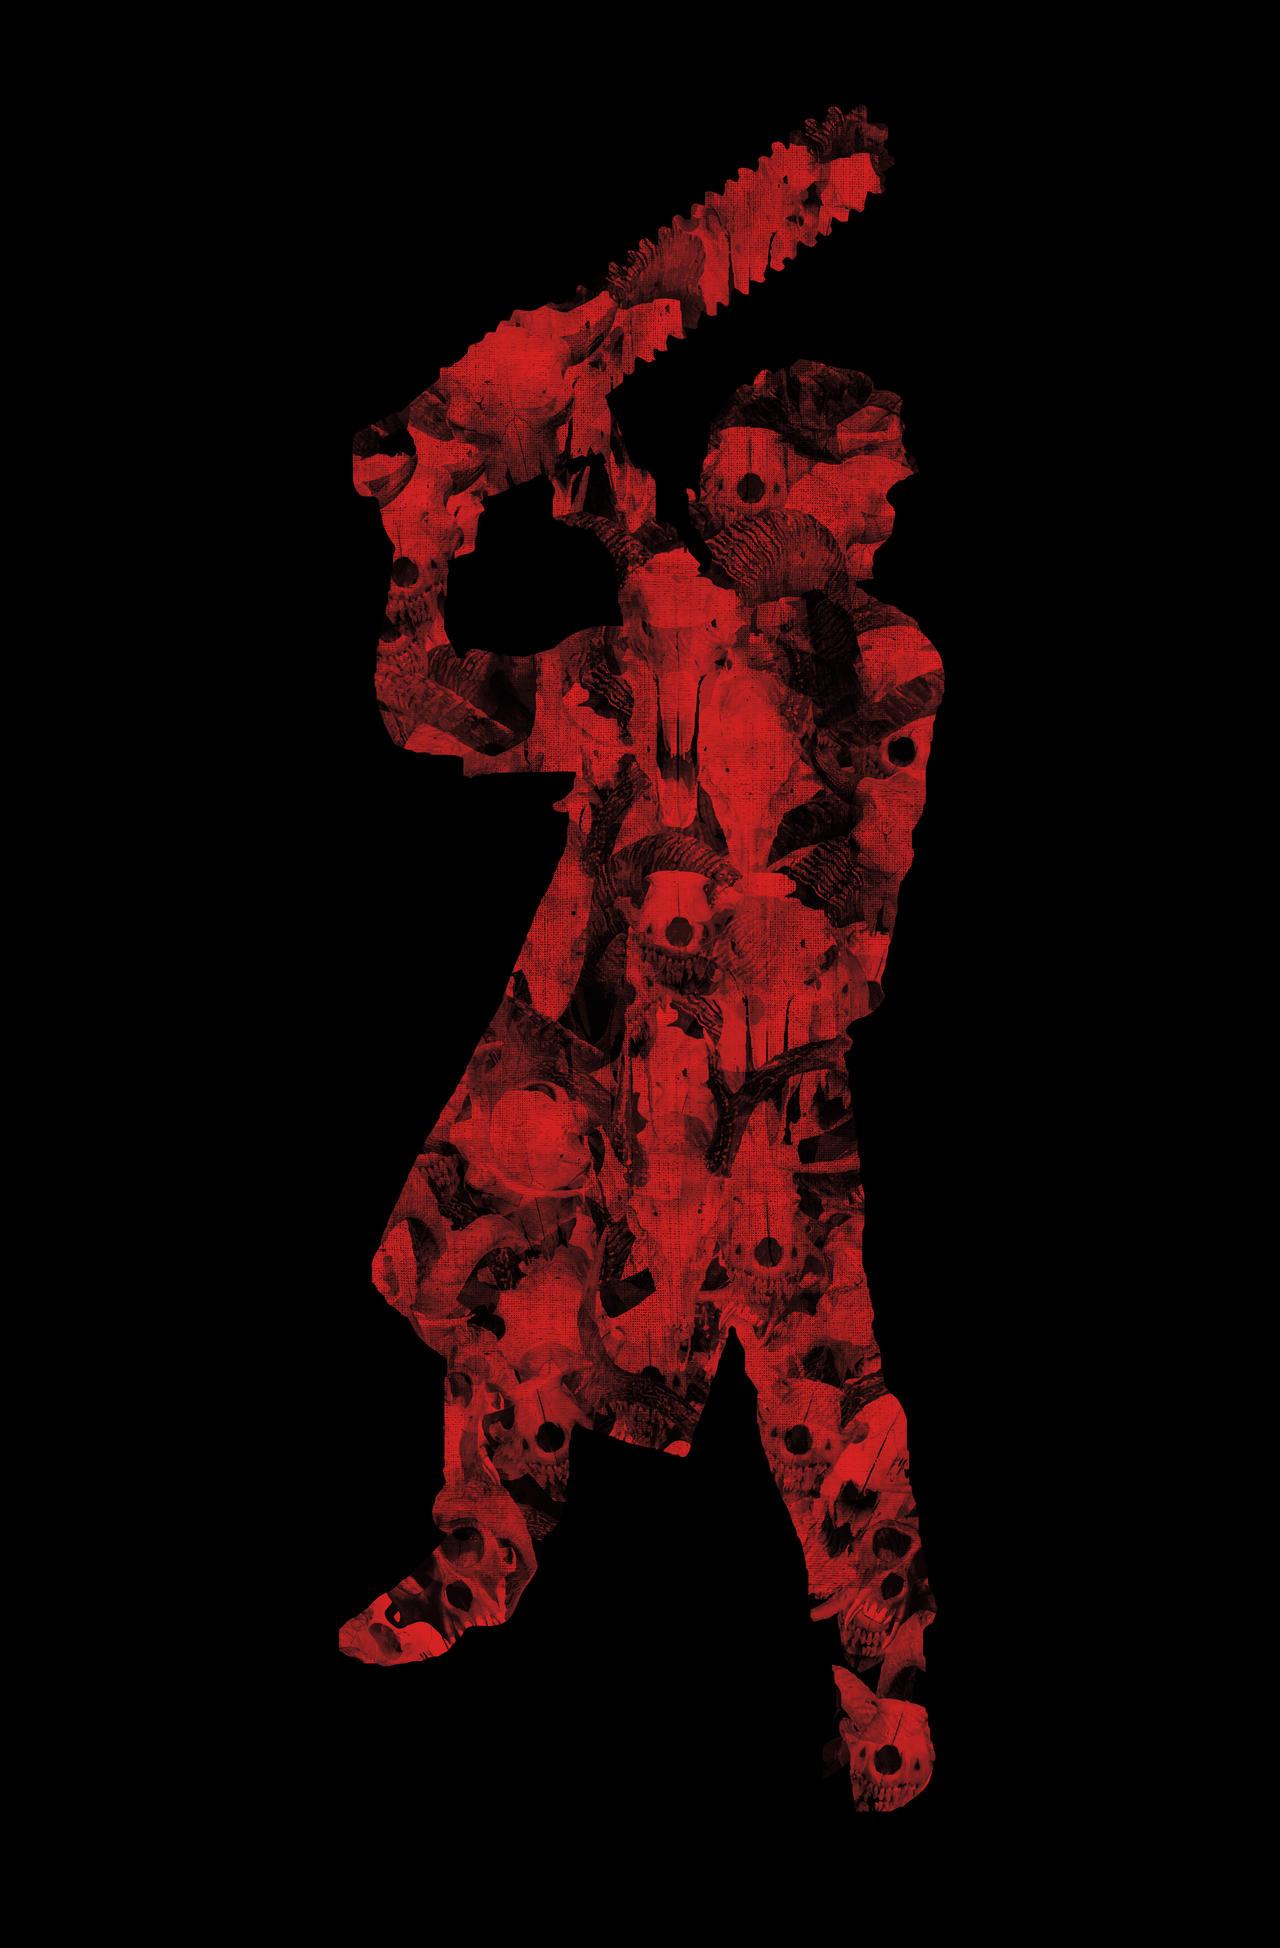 leatherface - texas chainsaw massacre (1974)nickcasale on deviantart